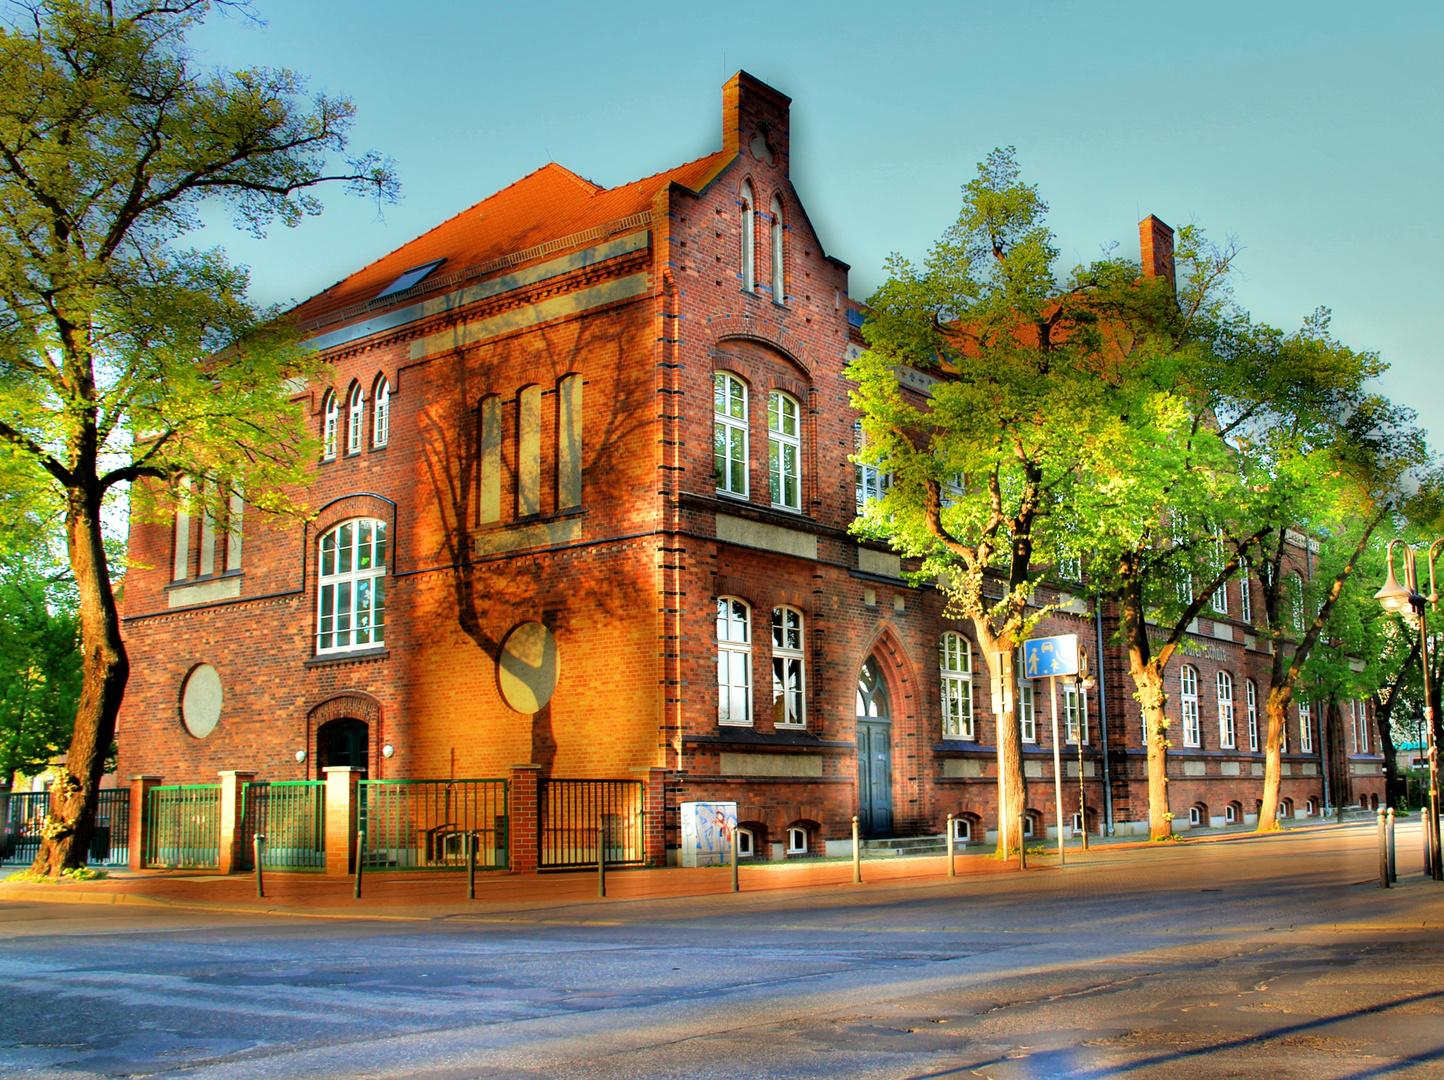 Fritz-Reuter-Schule glänzt wieder